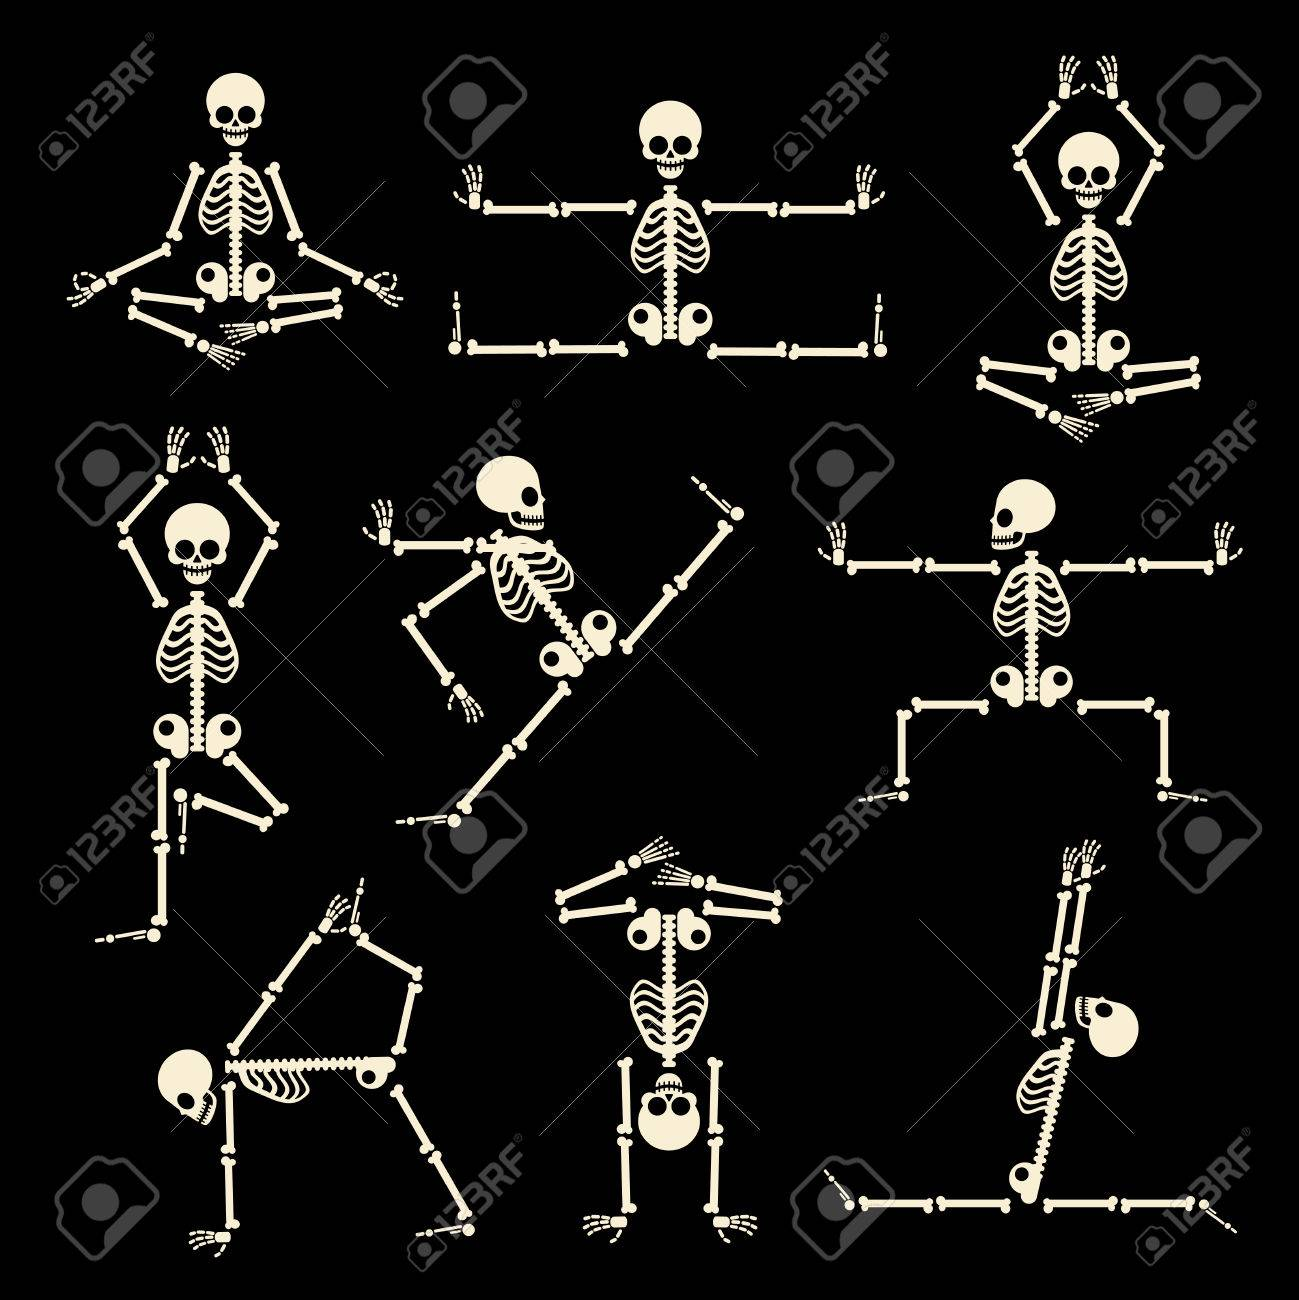 Kung fu and yoga skeletons set. Human pose anatomy, body comic, healthy fitness, vector illustration Stock Vector - 50709776